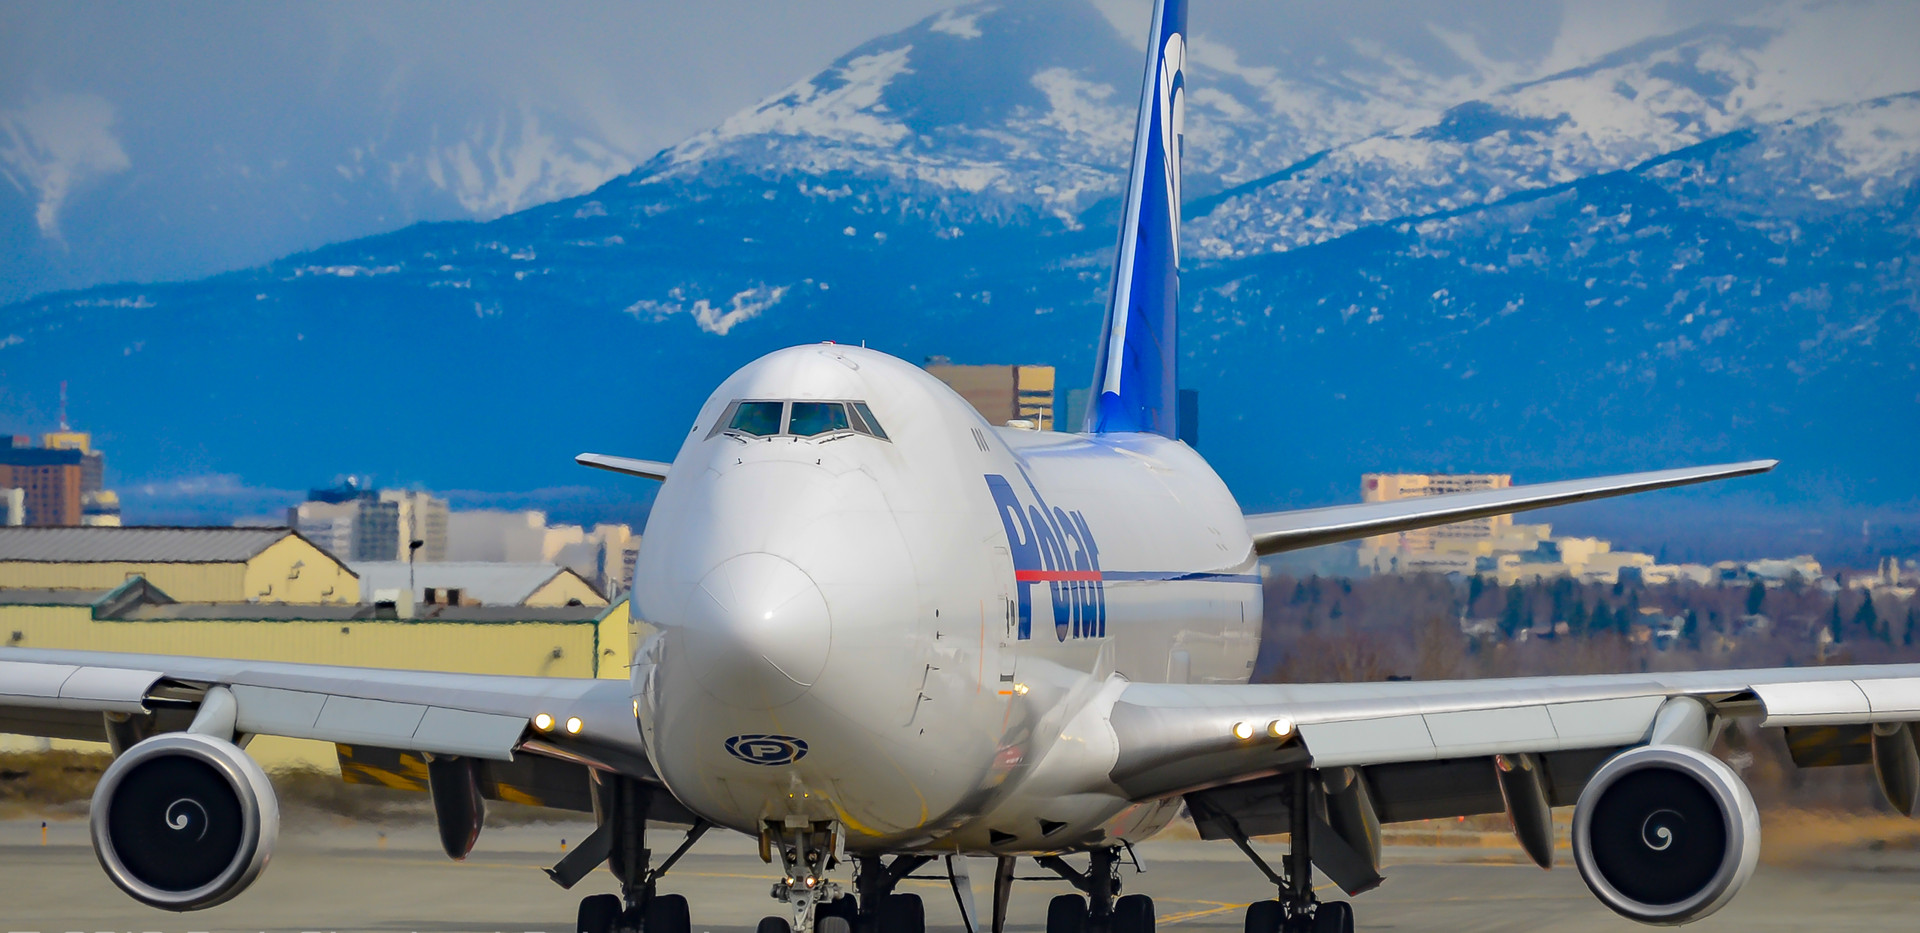 Polar Air Cargo 747-400F taxis at Anchorage, 2012